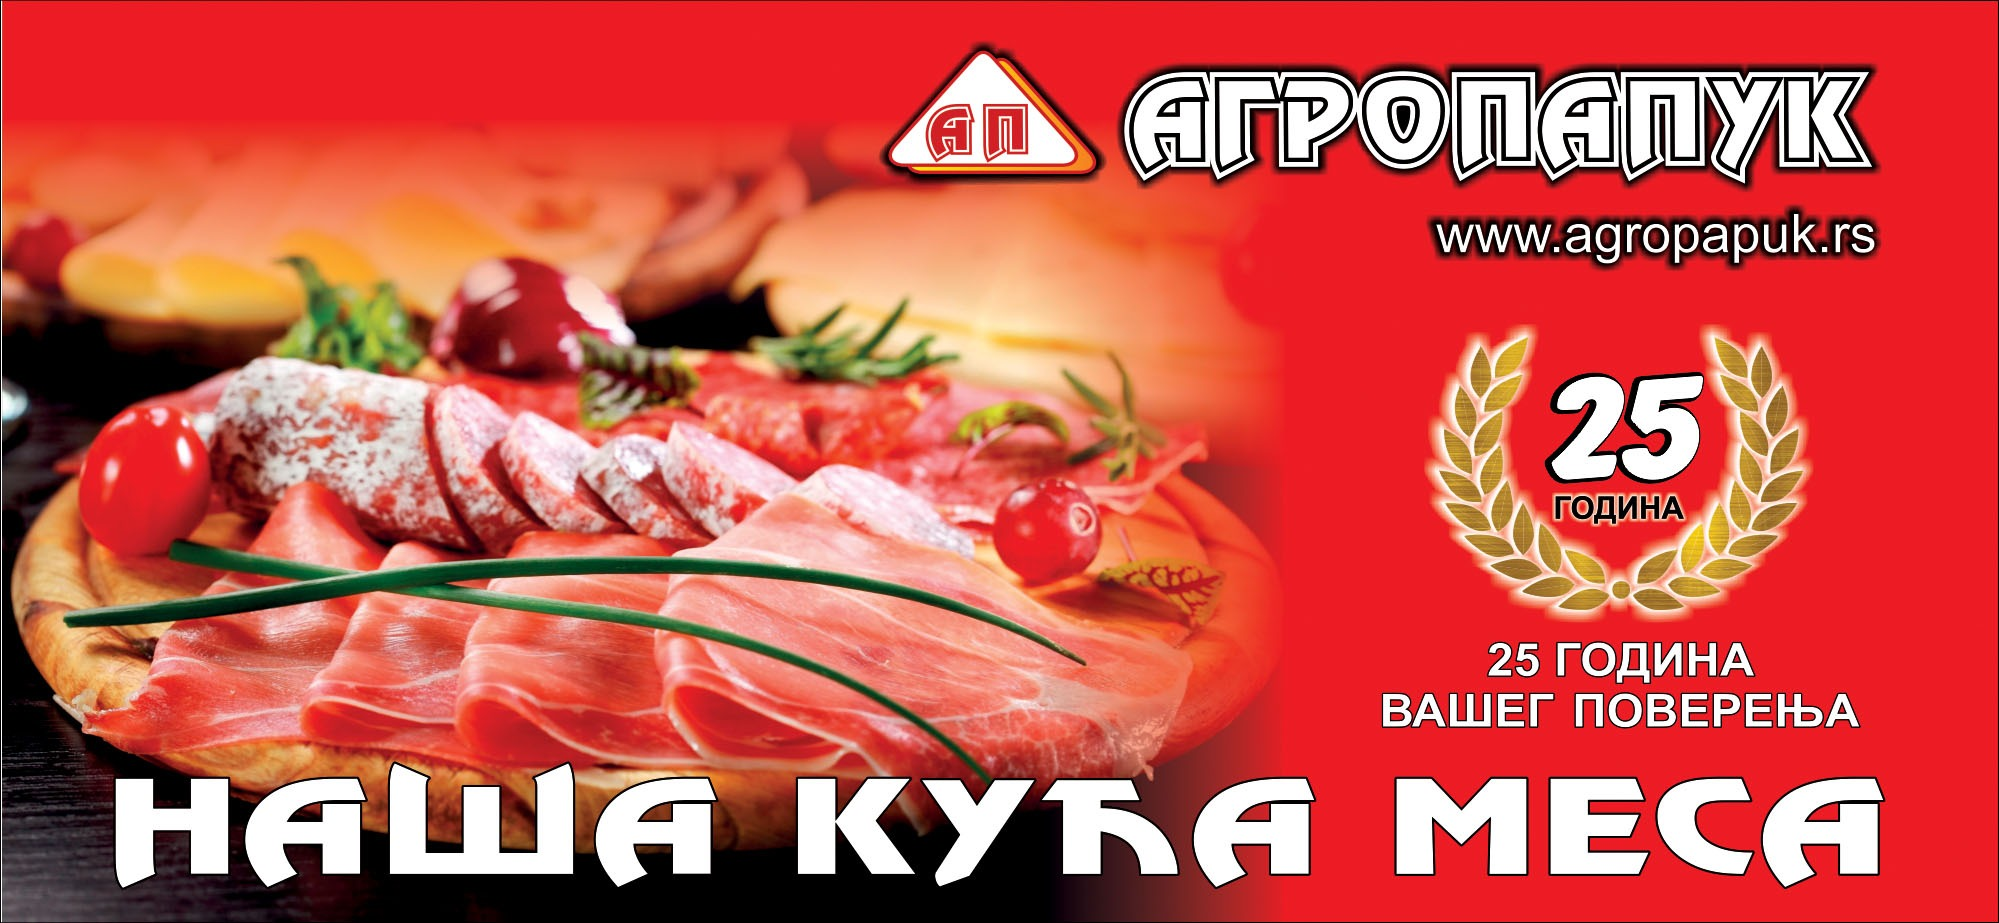 Agropapuk - naša kuća mesa